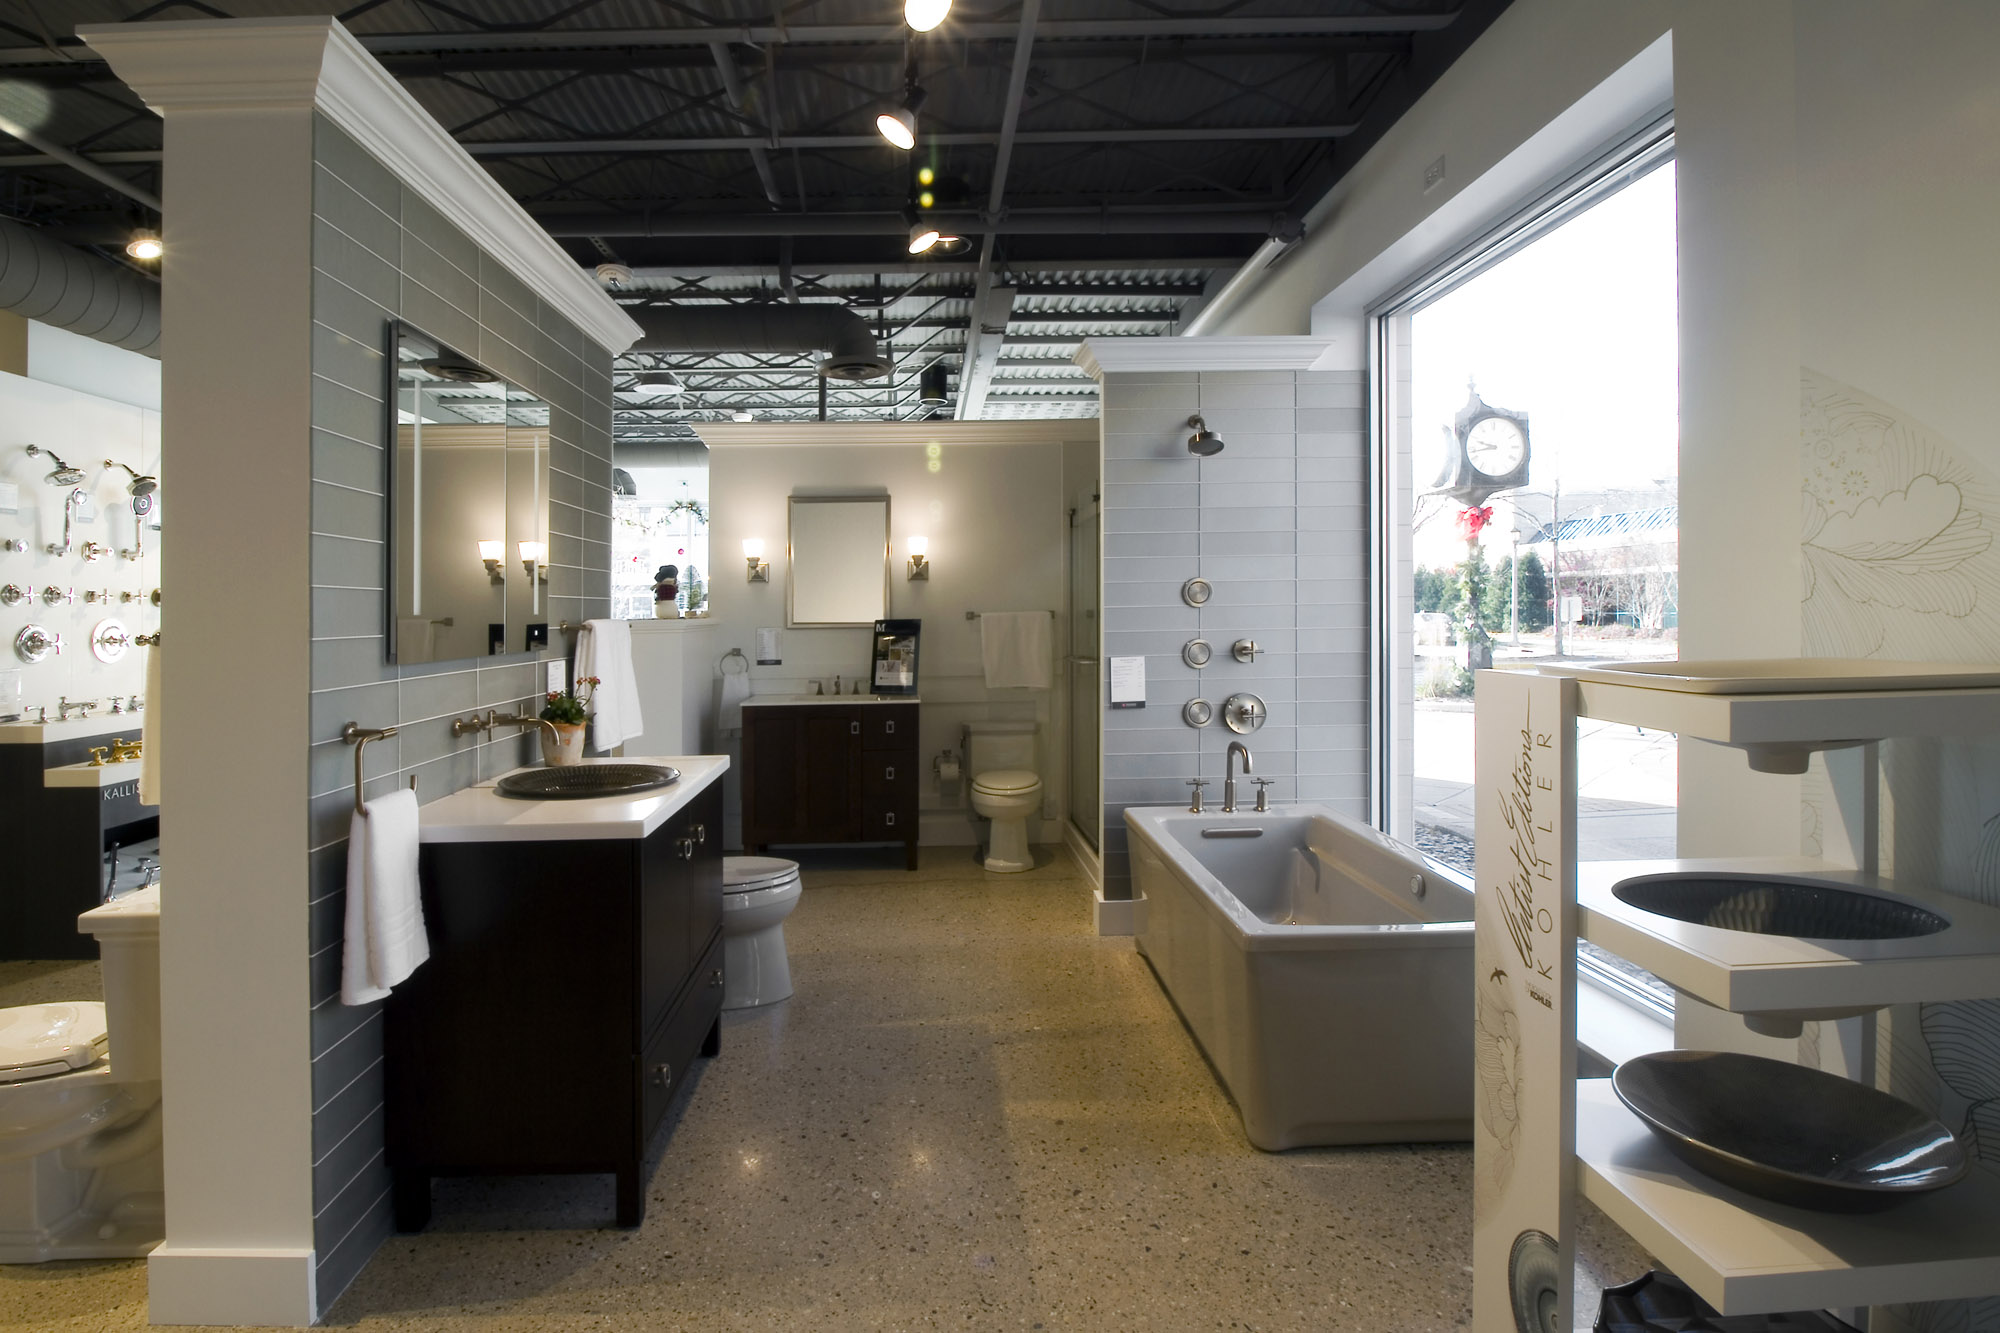 Gerhards Kitchen And Bath Kenosha